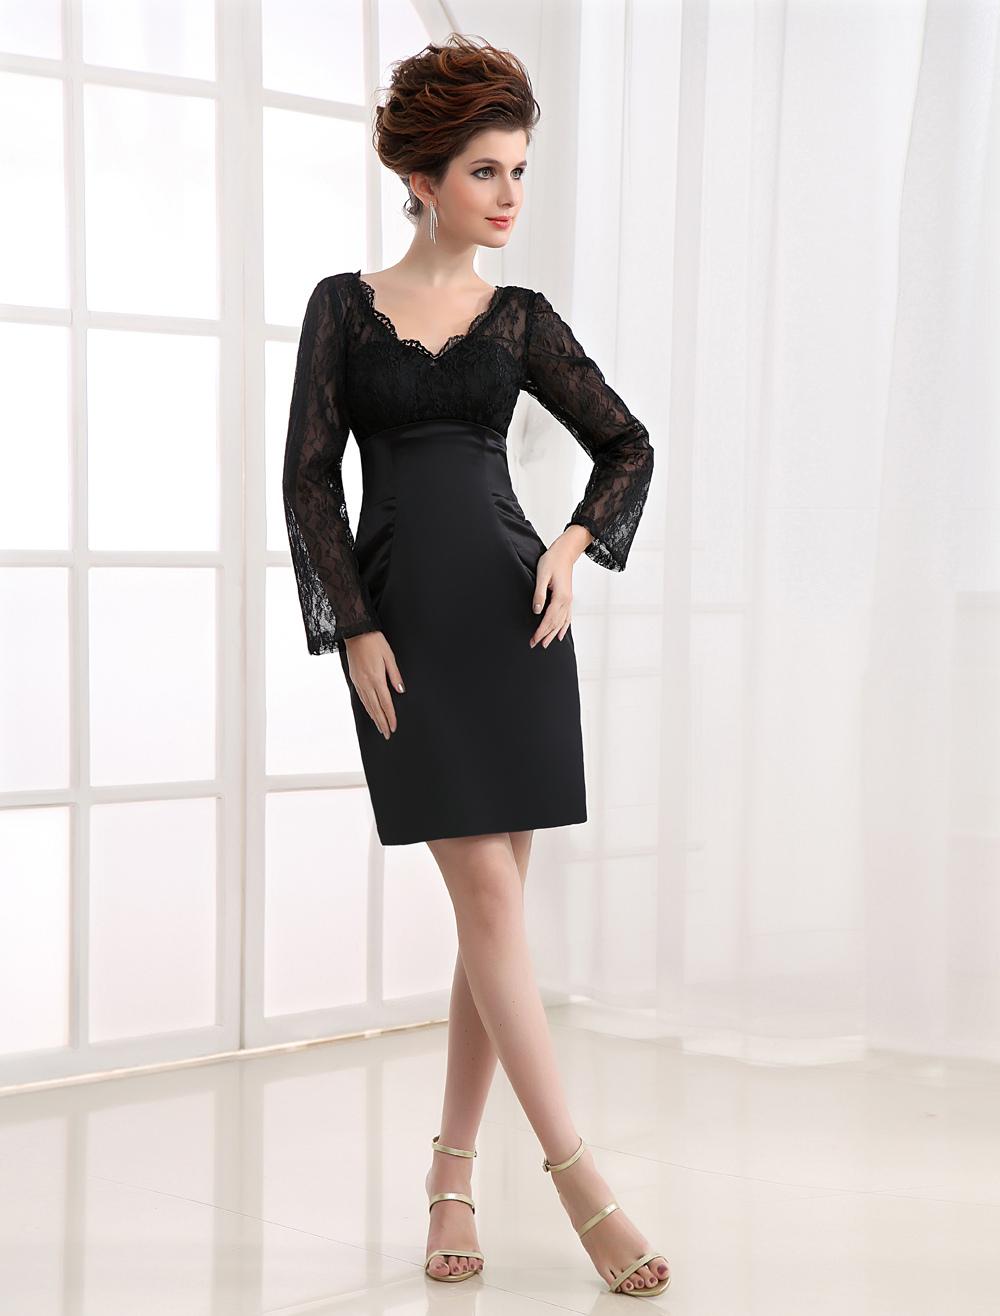 Black Long Sleeves Lace V-Neck Sheath Satin Cocktail Dress (Wedding Cocktail Dresses) photo